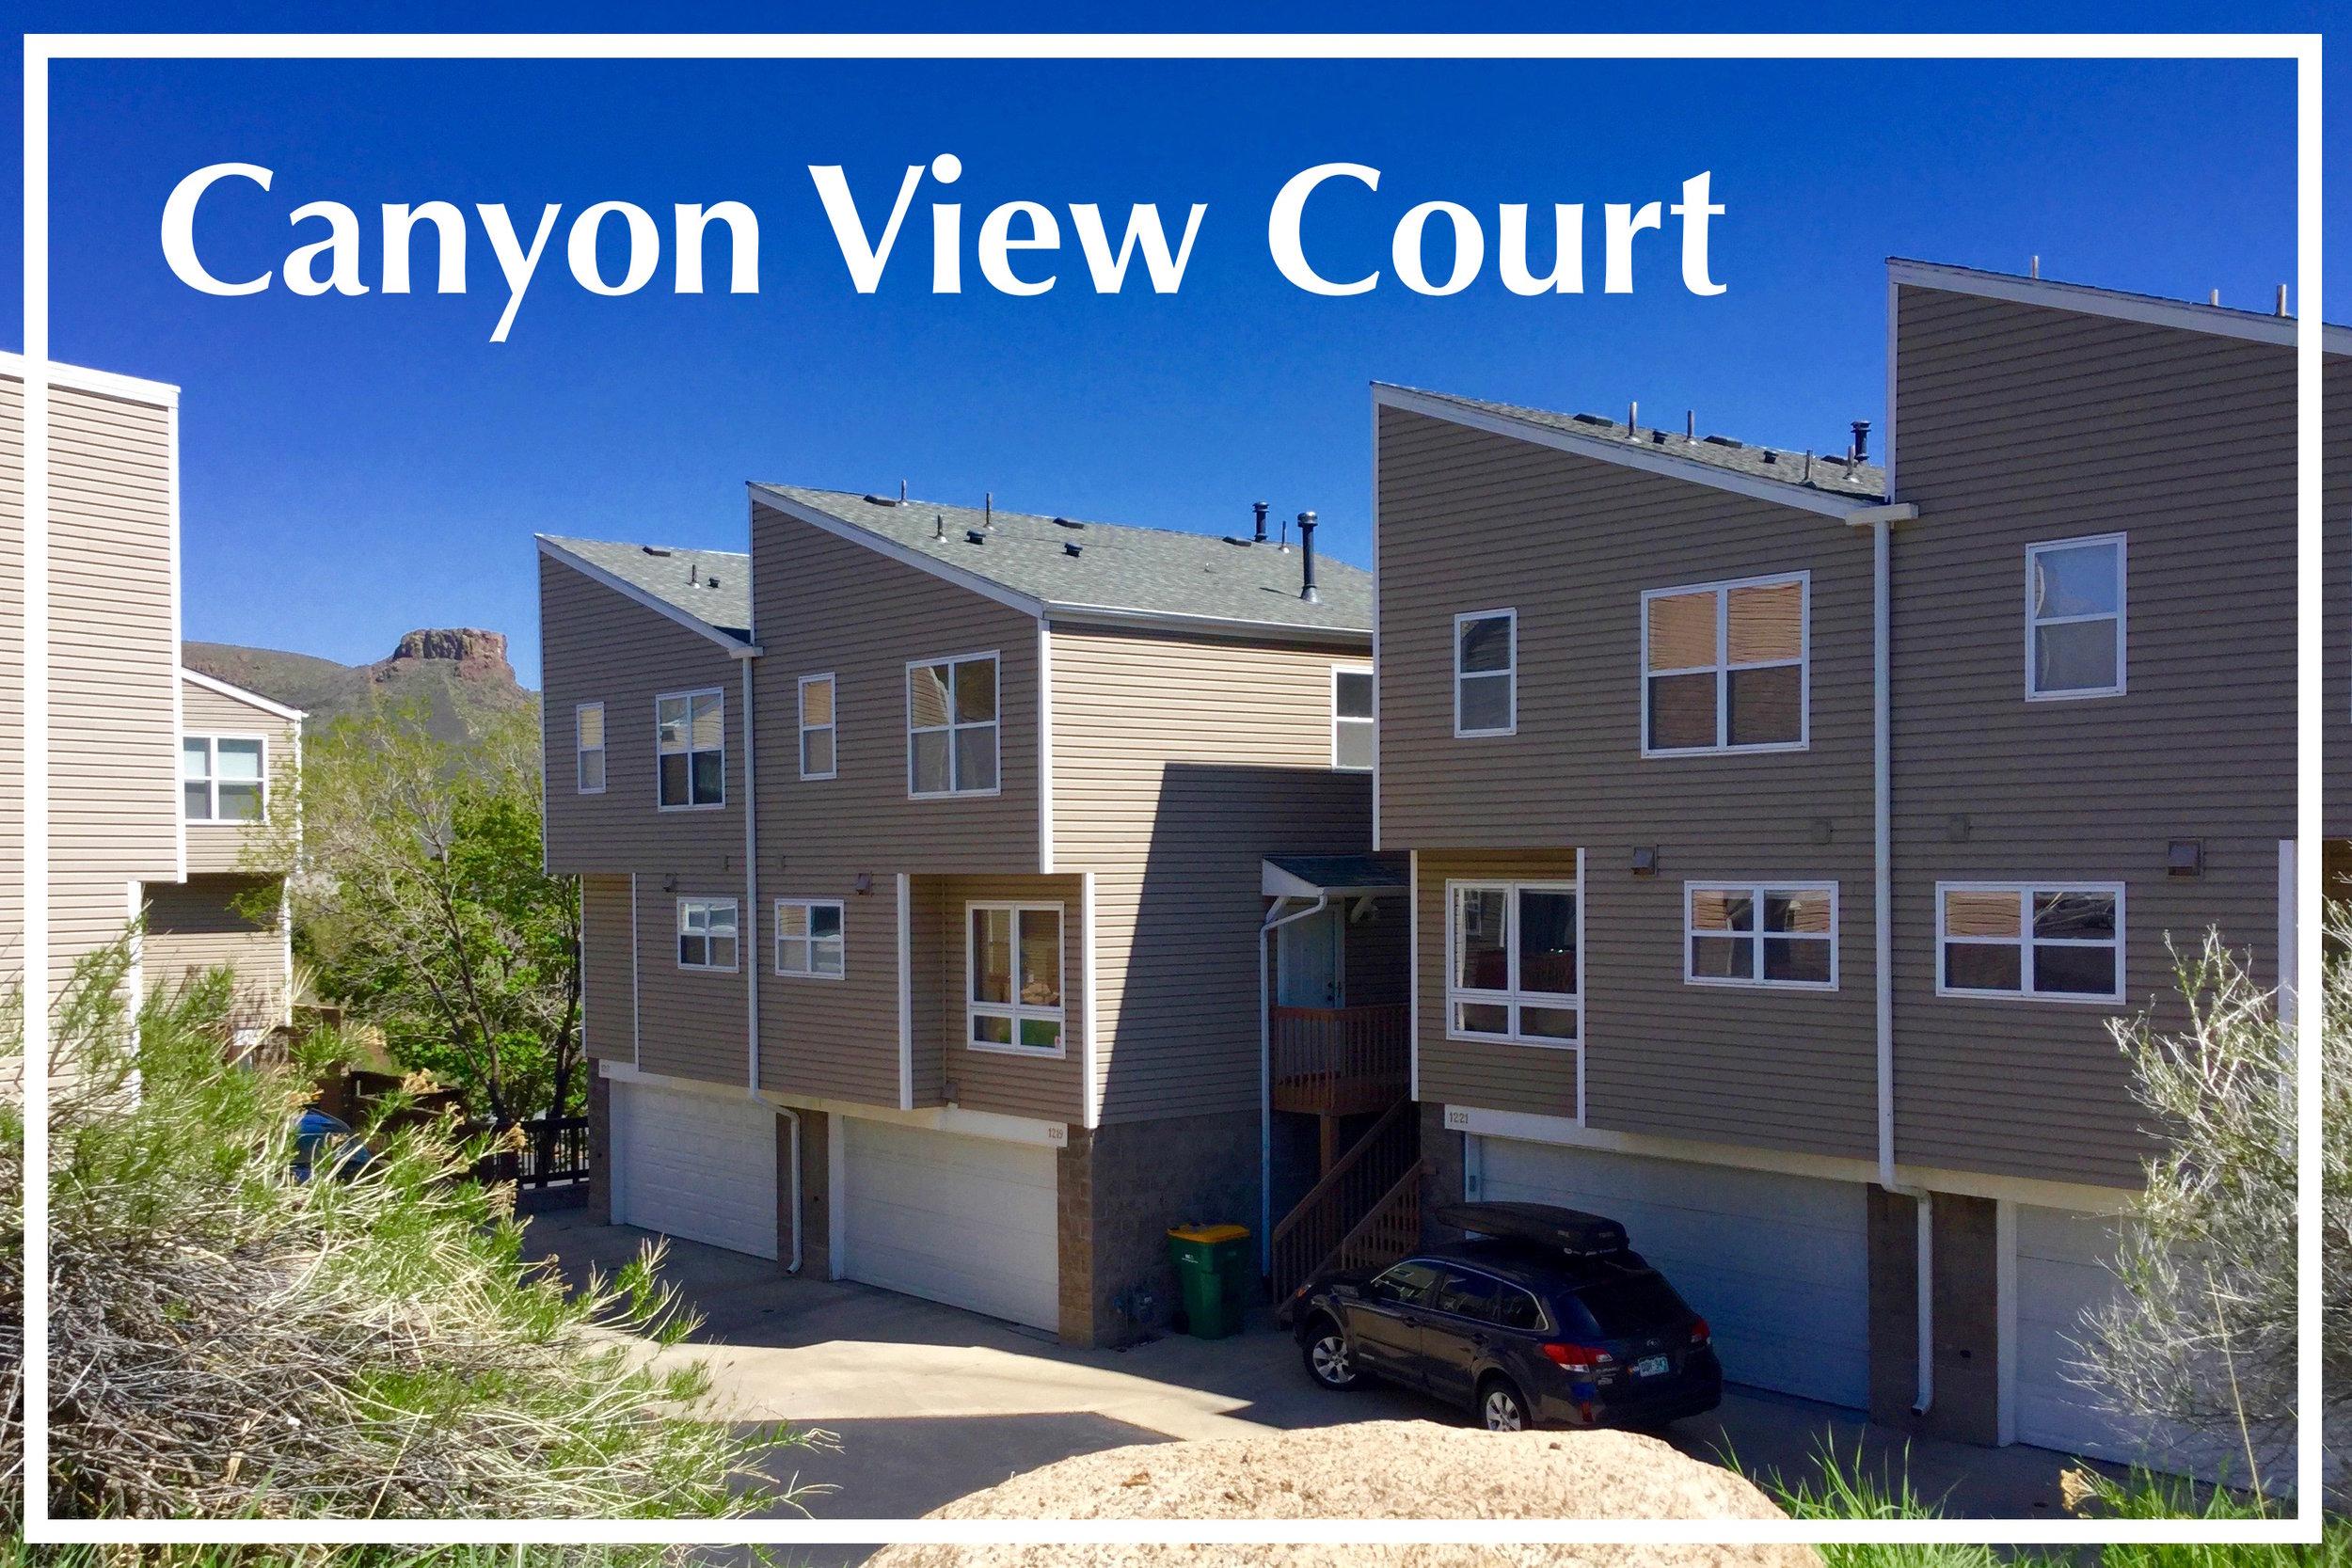 Canyon View Court.jpg